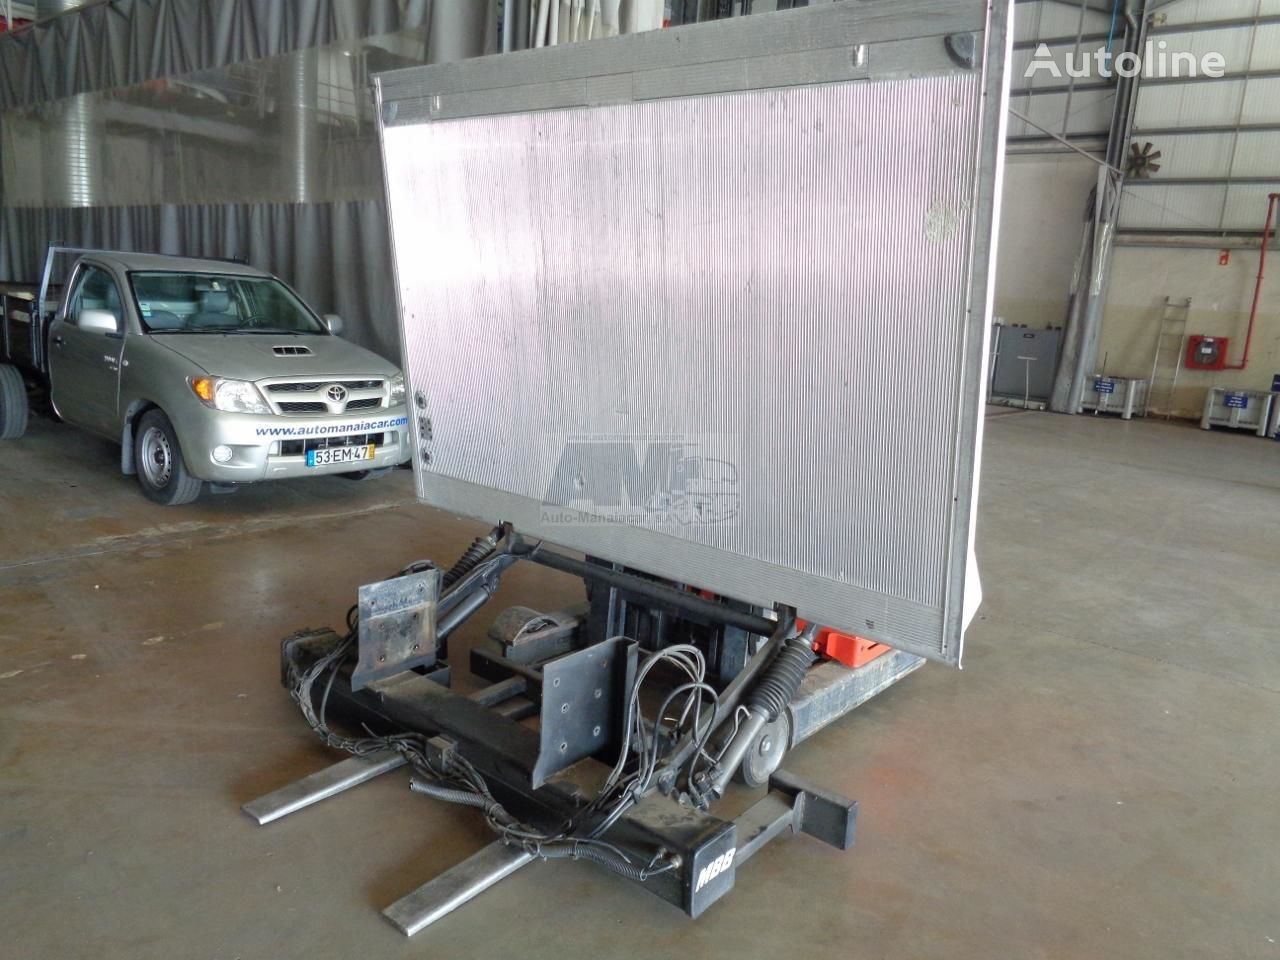 plataforma elevatoria hidraulica PALFINGER MBB